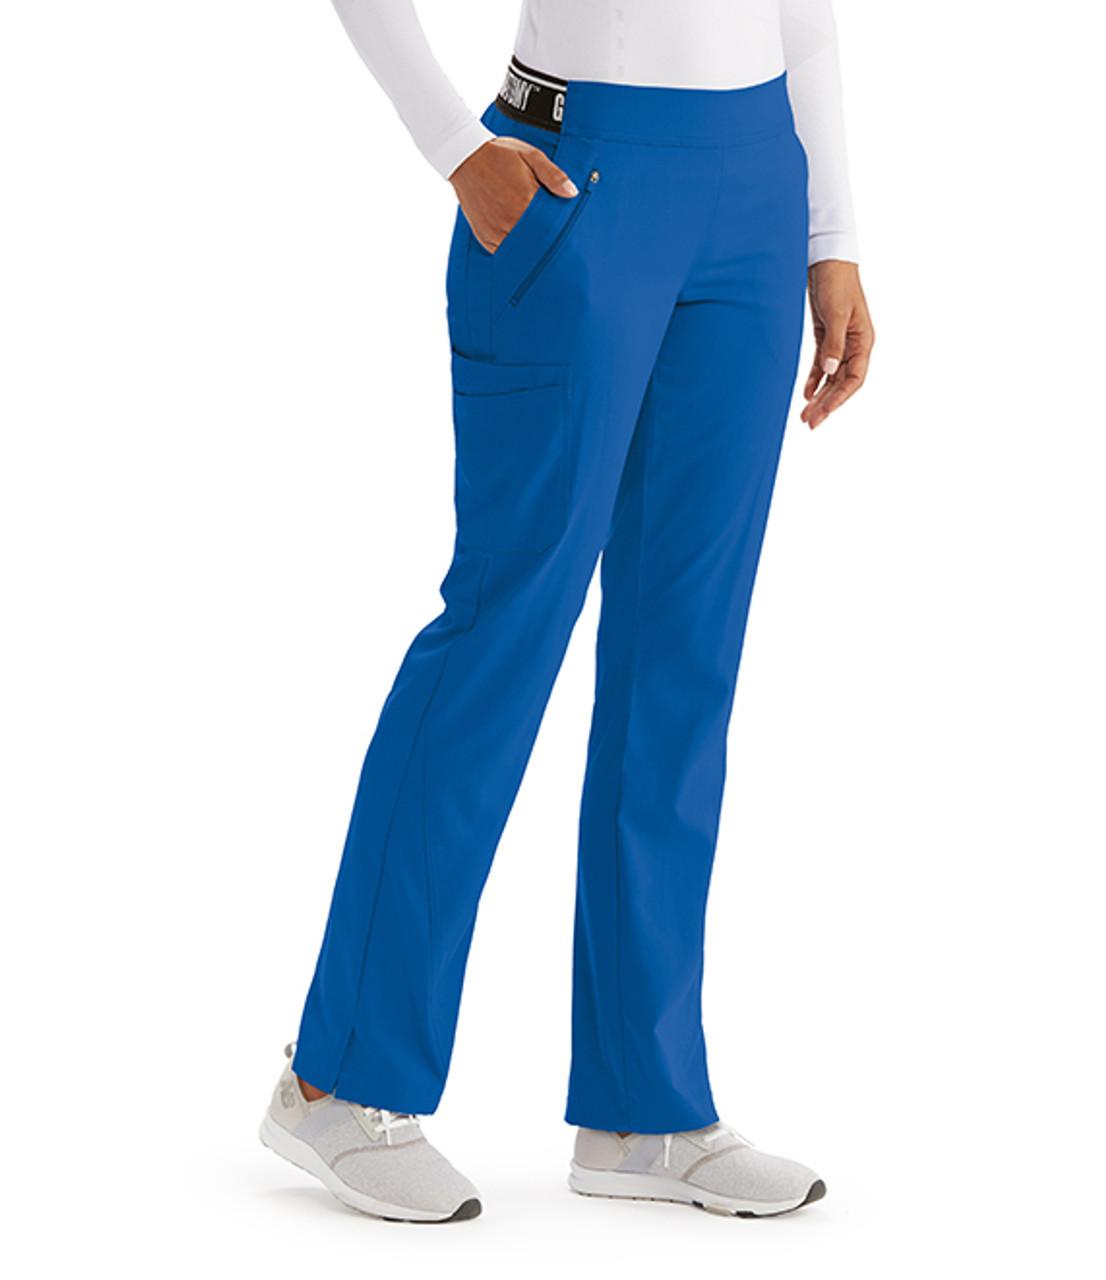 (GVSP515) Grey's Anatomy Spandex Stretch 4 Pocket Knit Waist Scrub Pants